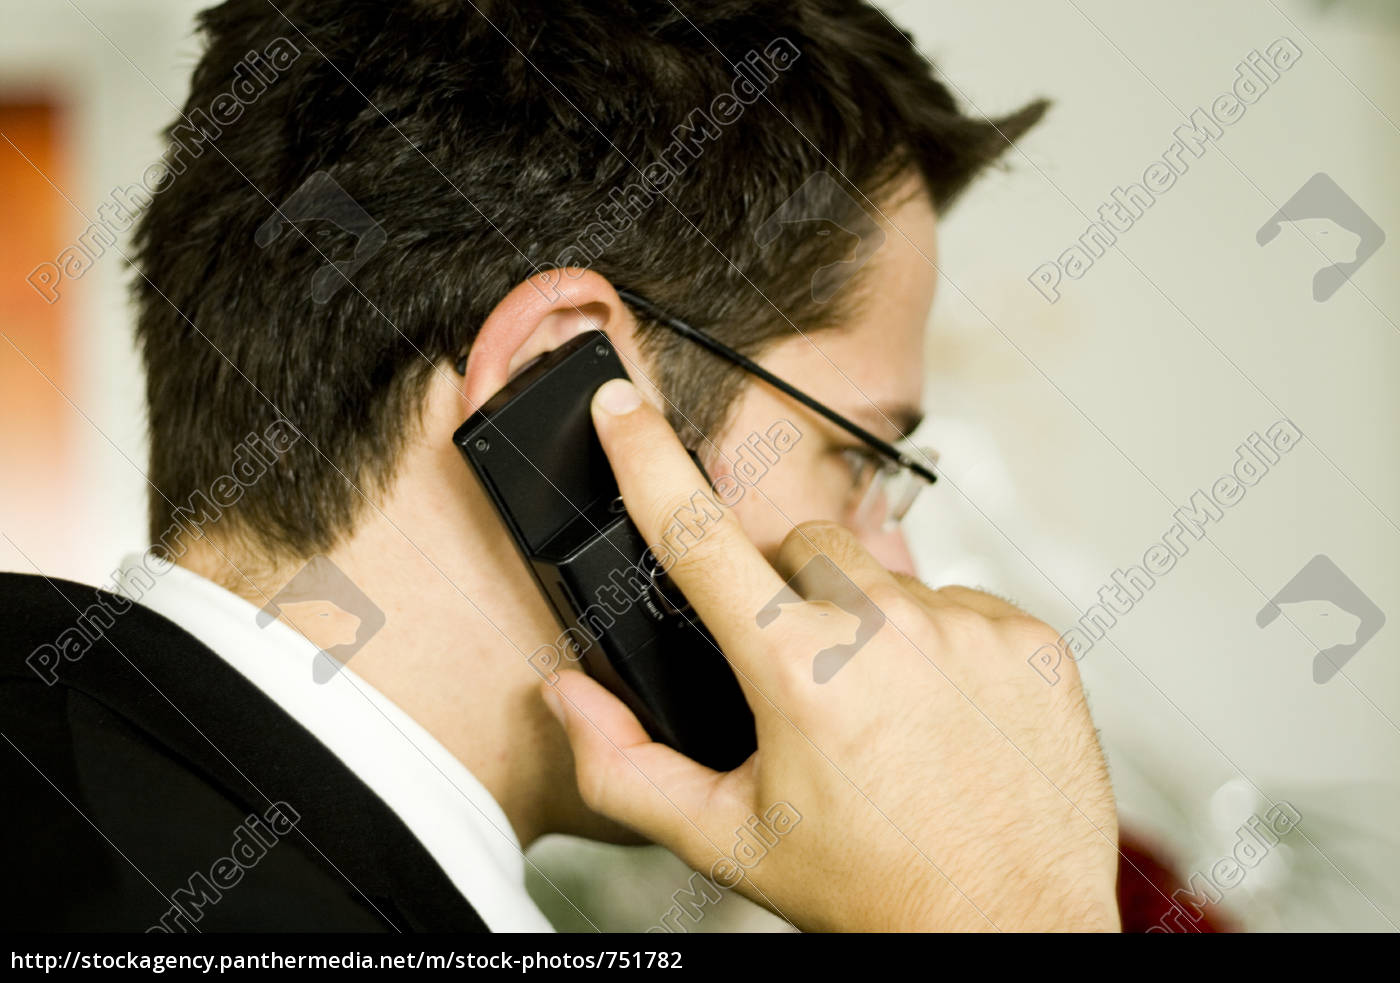 mobile, phone - 751782